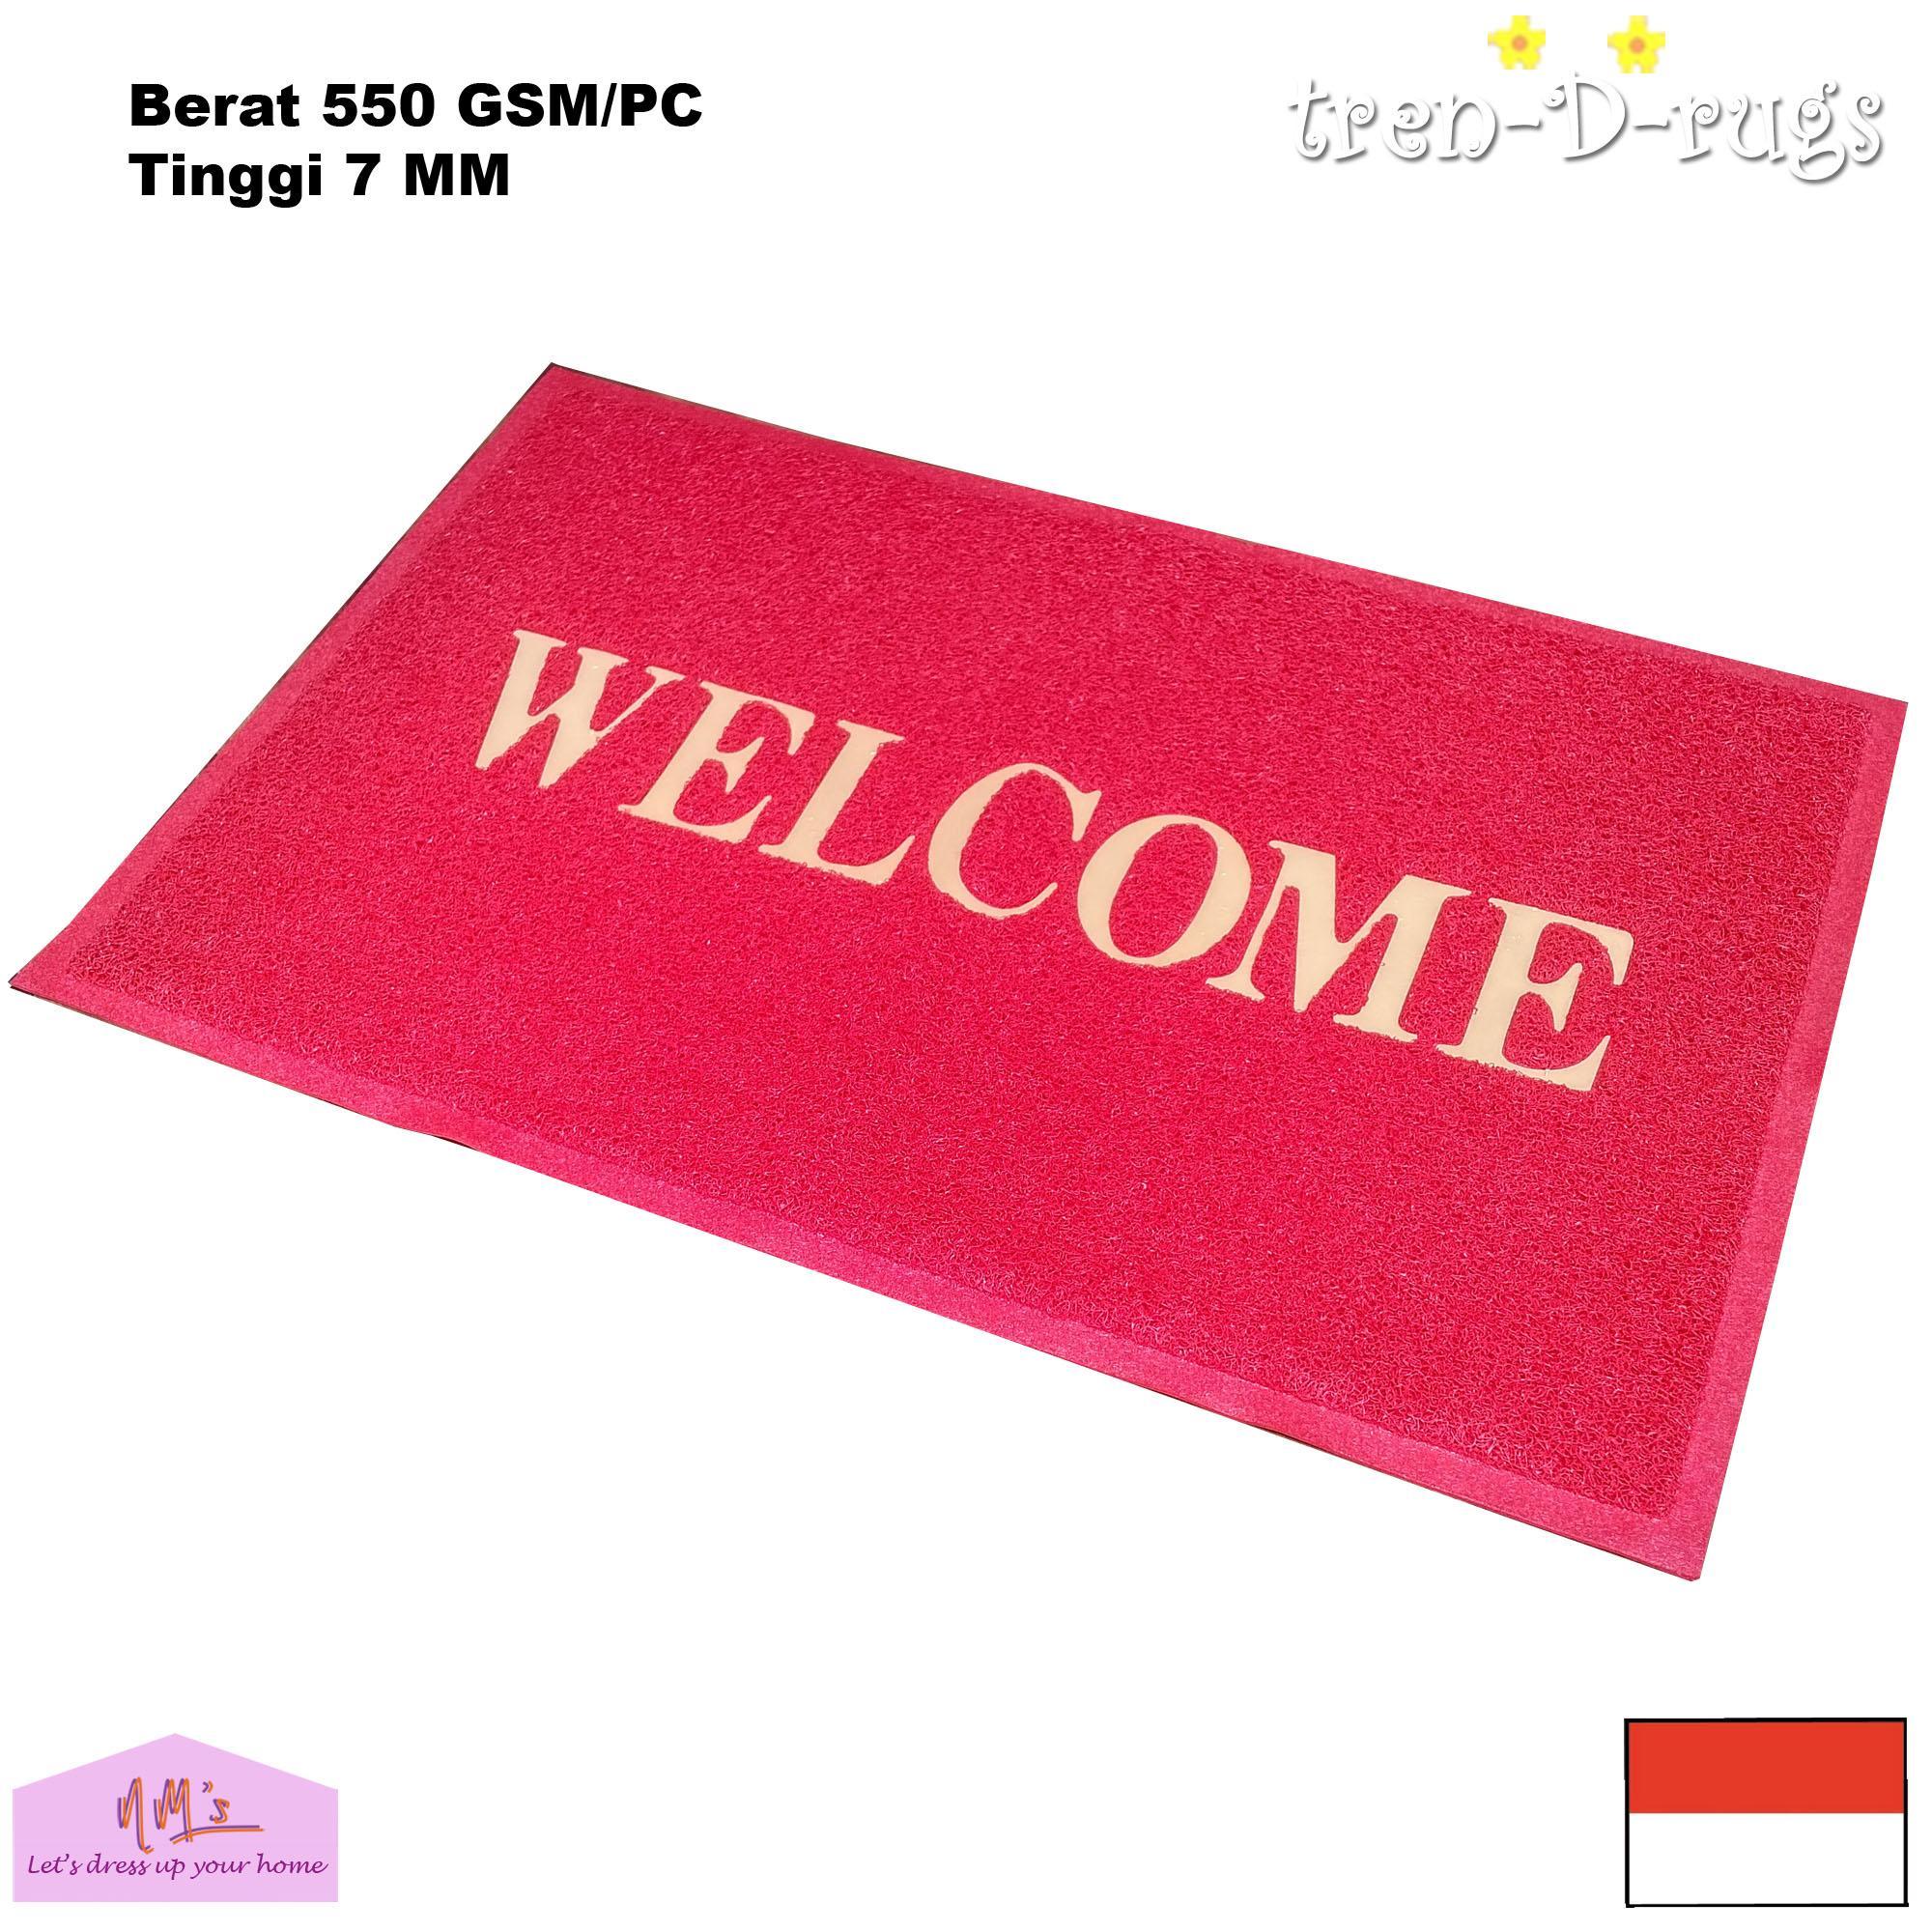 Tren-D-rugs - Keset Kaki Mie Bihun PVC Motif Welcome 40 cm x